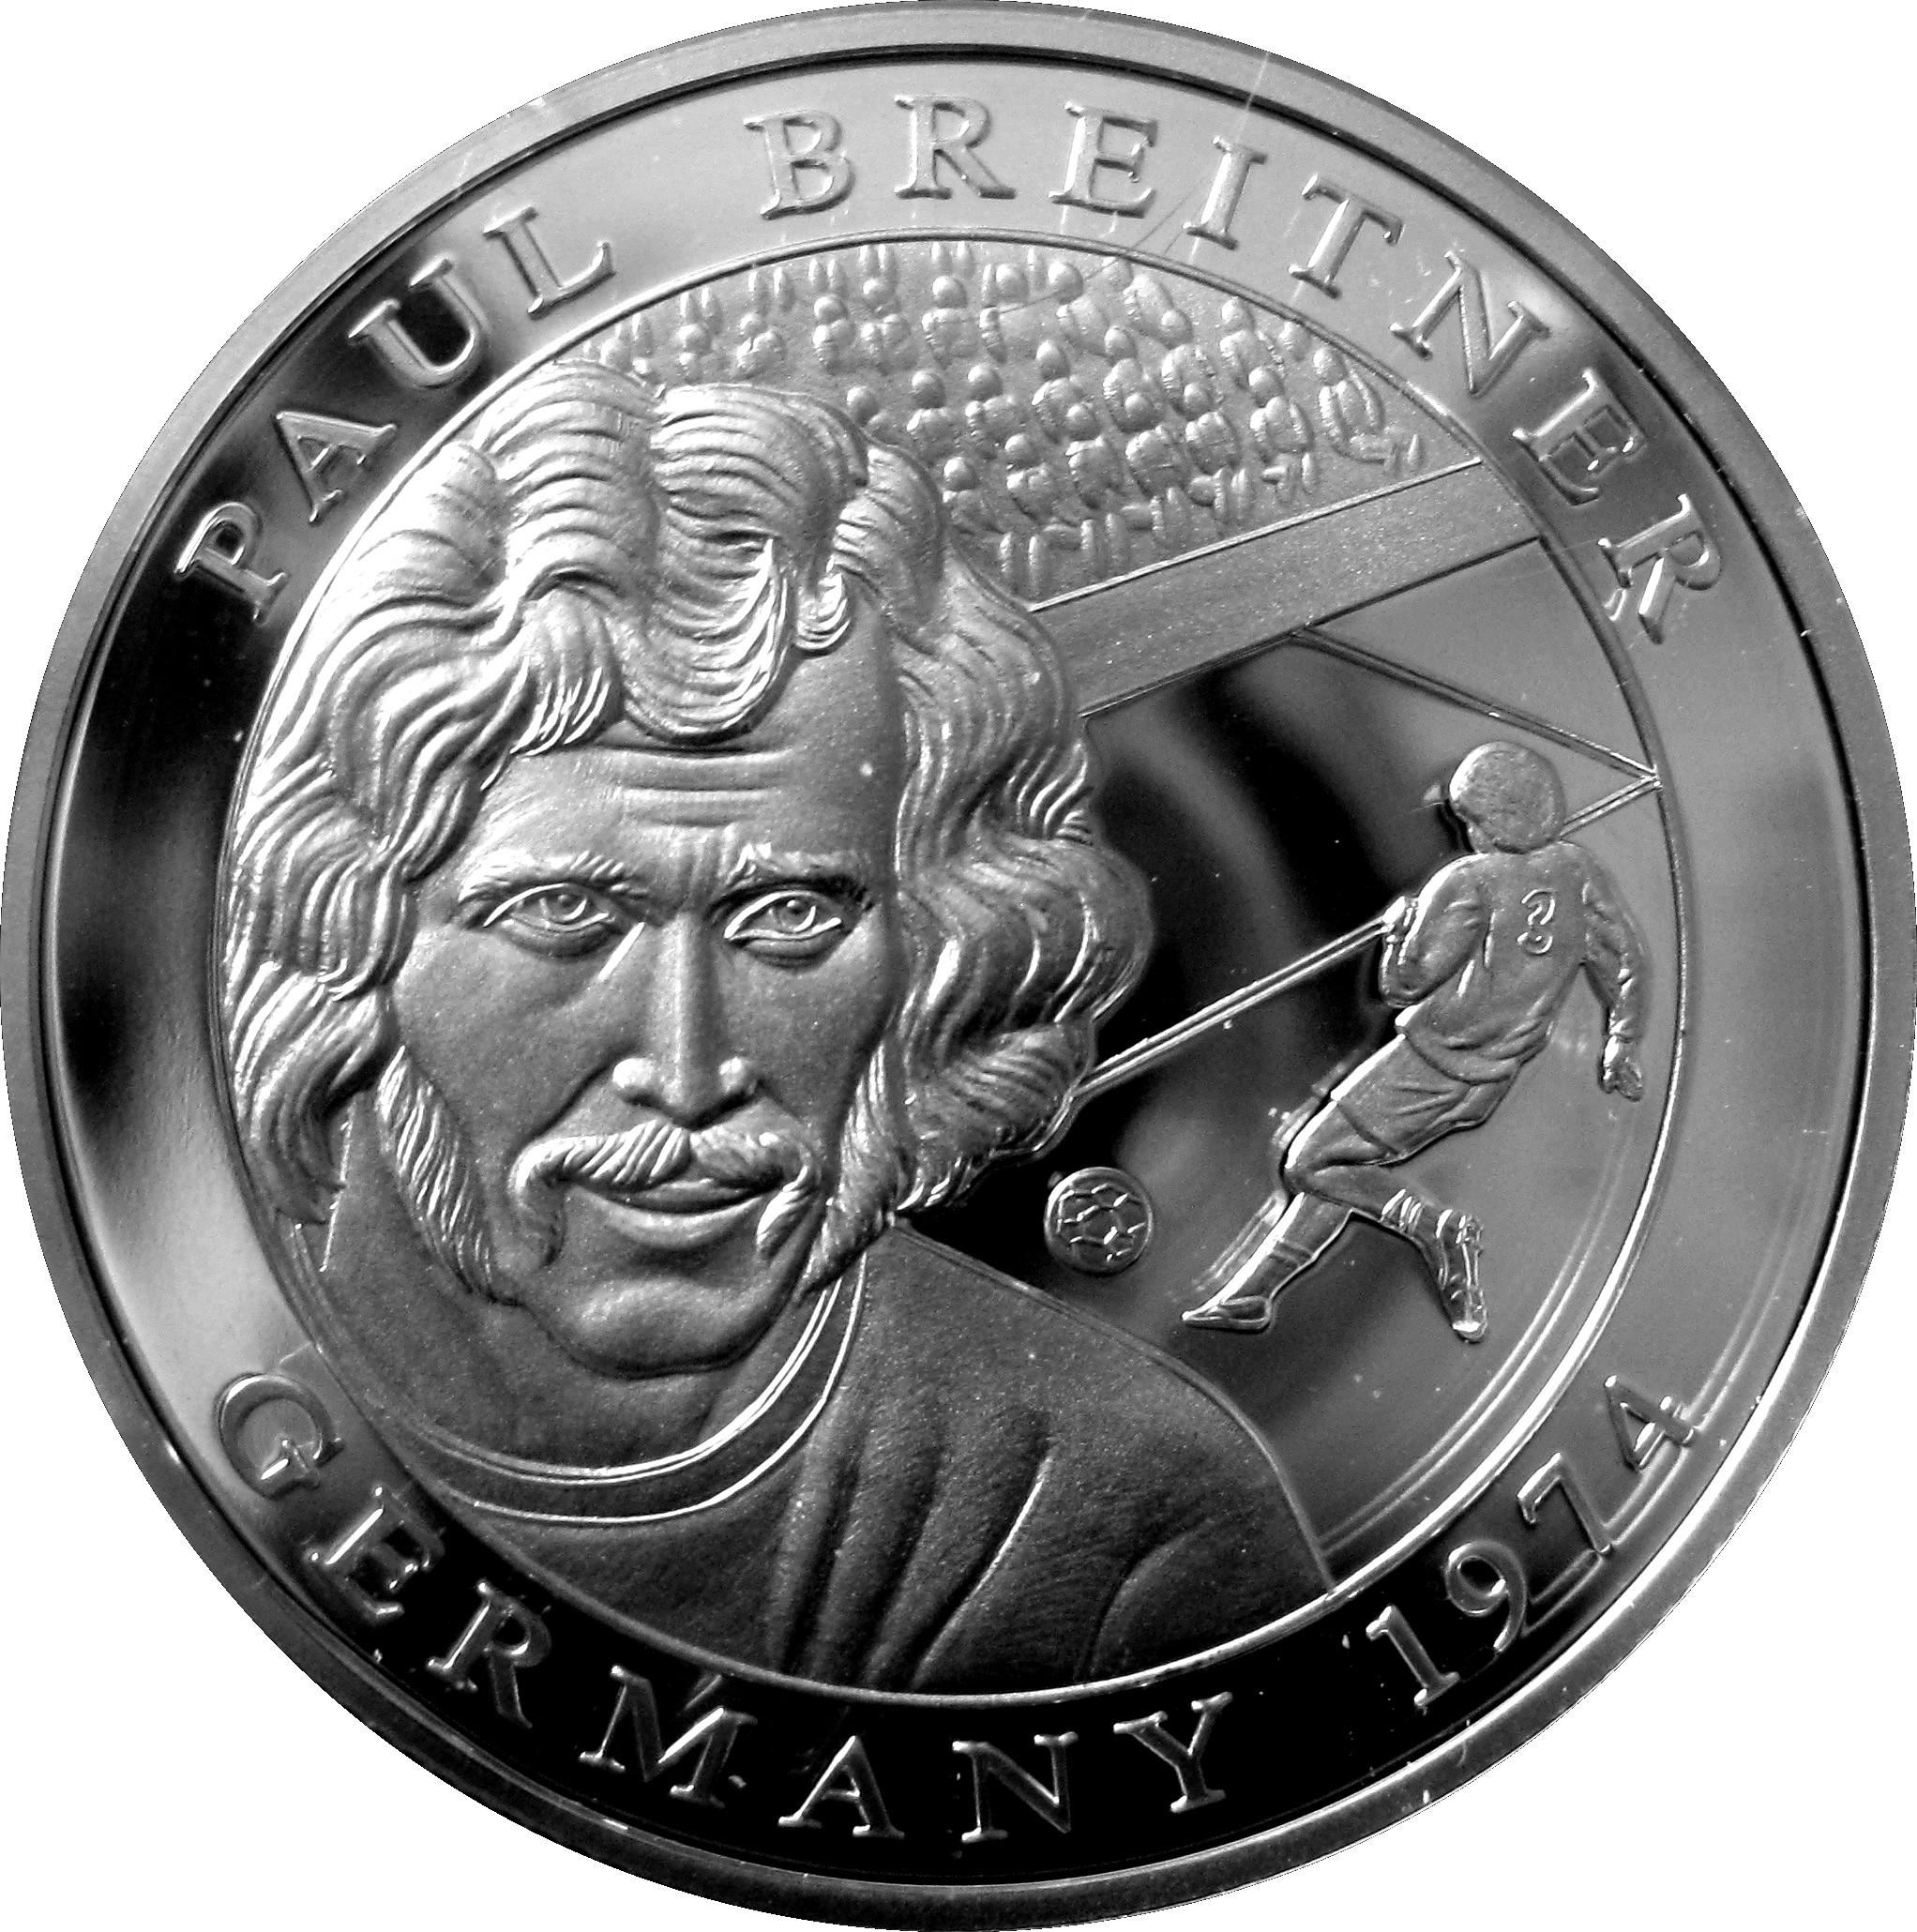 10 Dollars Paul Breitner Liberia – Numista